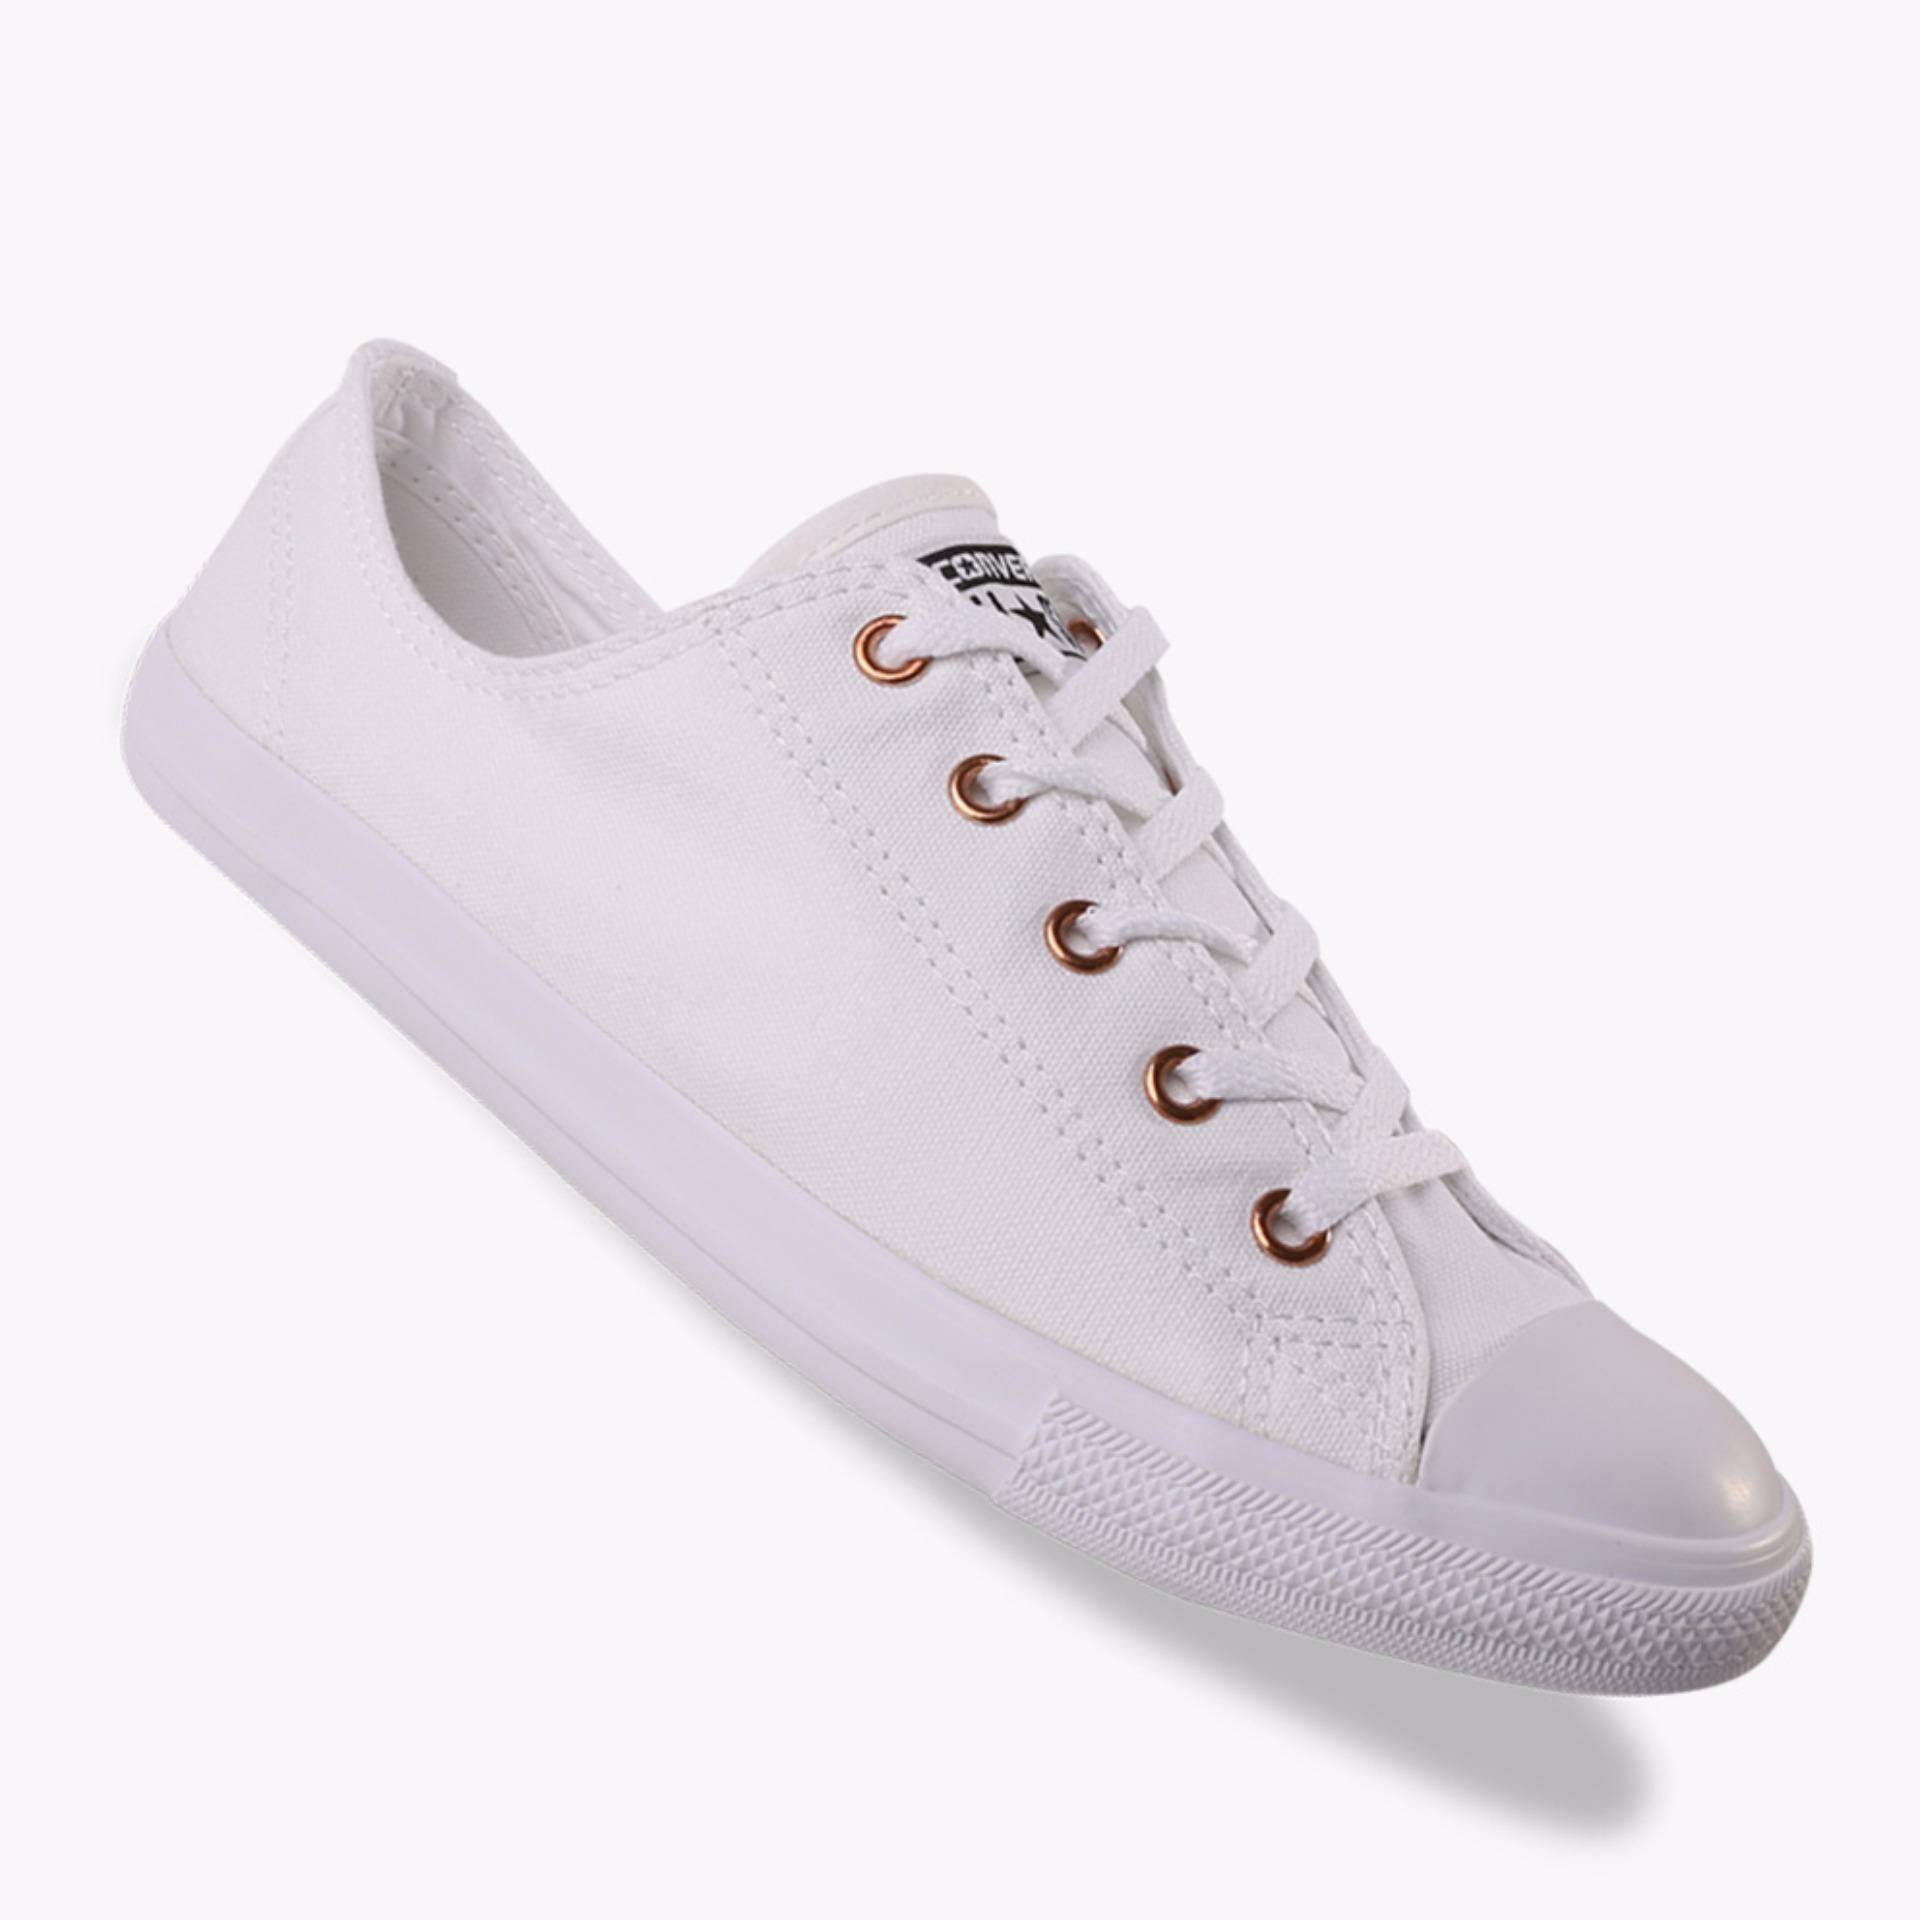 Beli Converse Chuck Taylor All Star Dainty Ox Women S Sneakers Shoes Putih  Online Terpercaya 0e675e6439